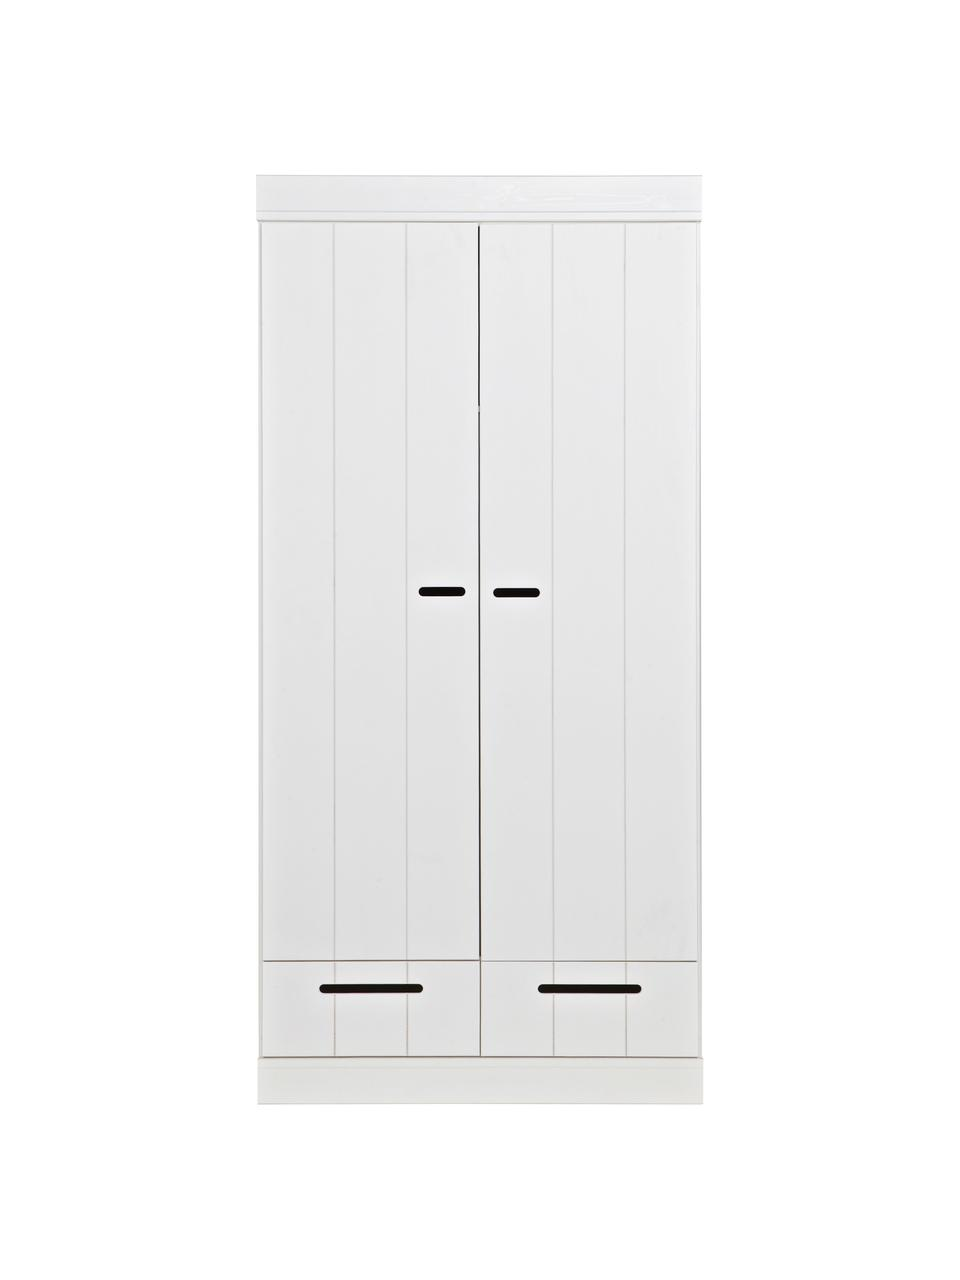 Guardaroba bianca con 2 ante Connect, Ripiani: melamina, Bianco, Larg. 94 x Alt. 195 cm